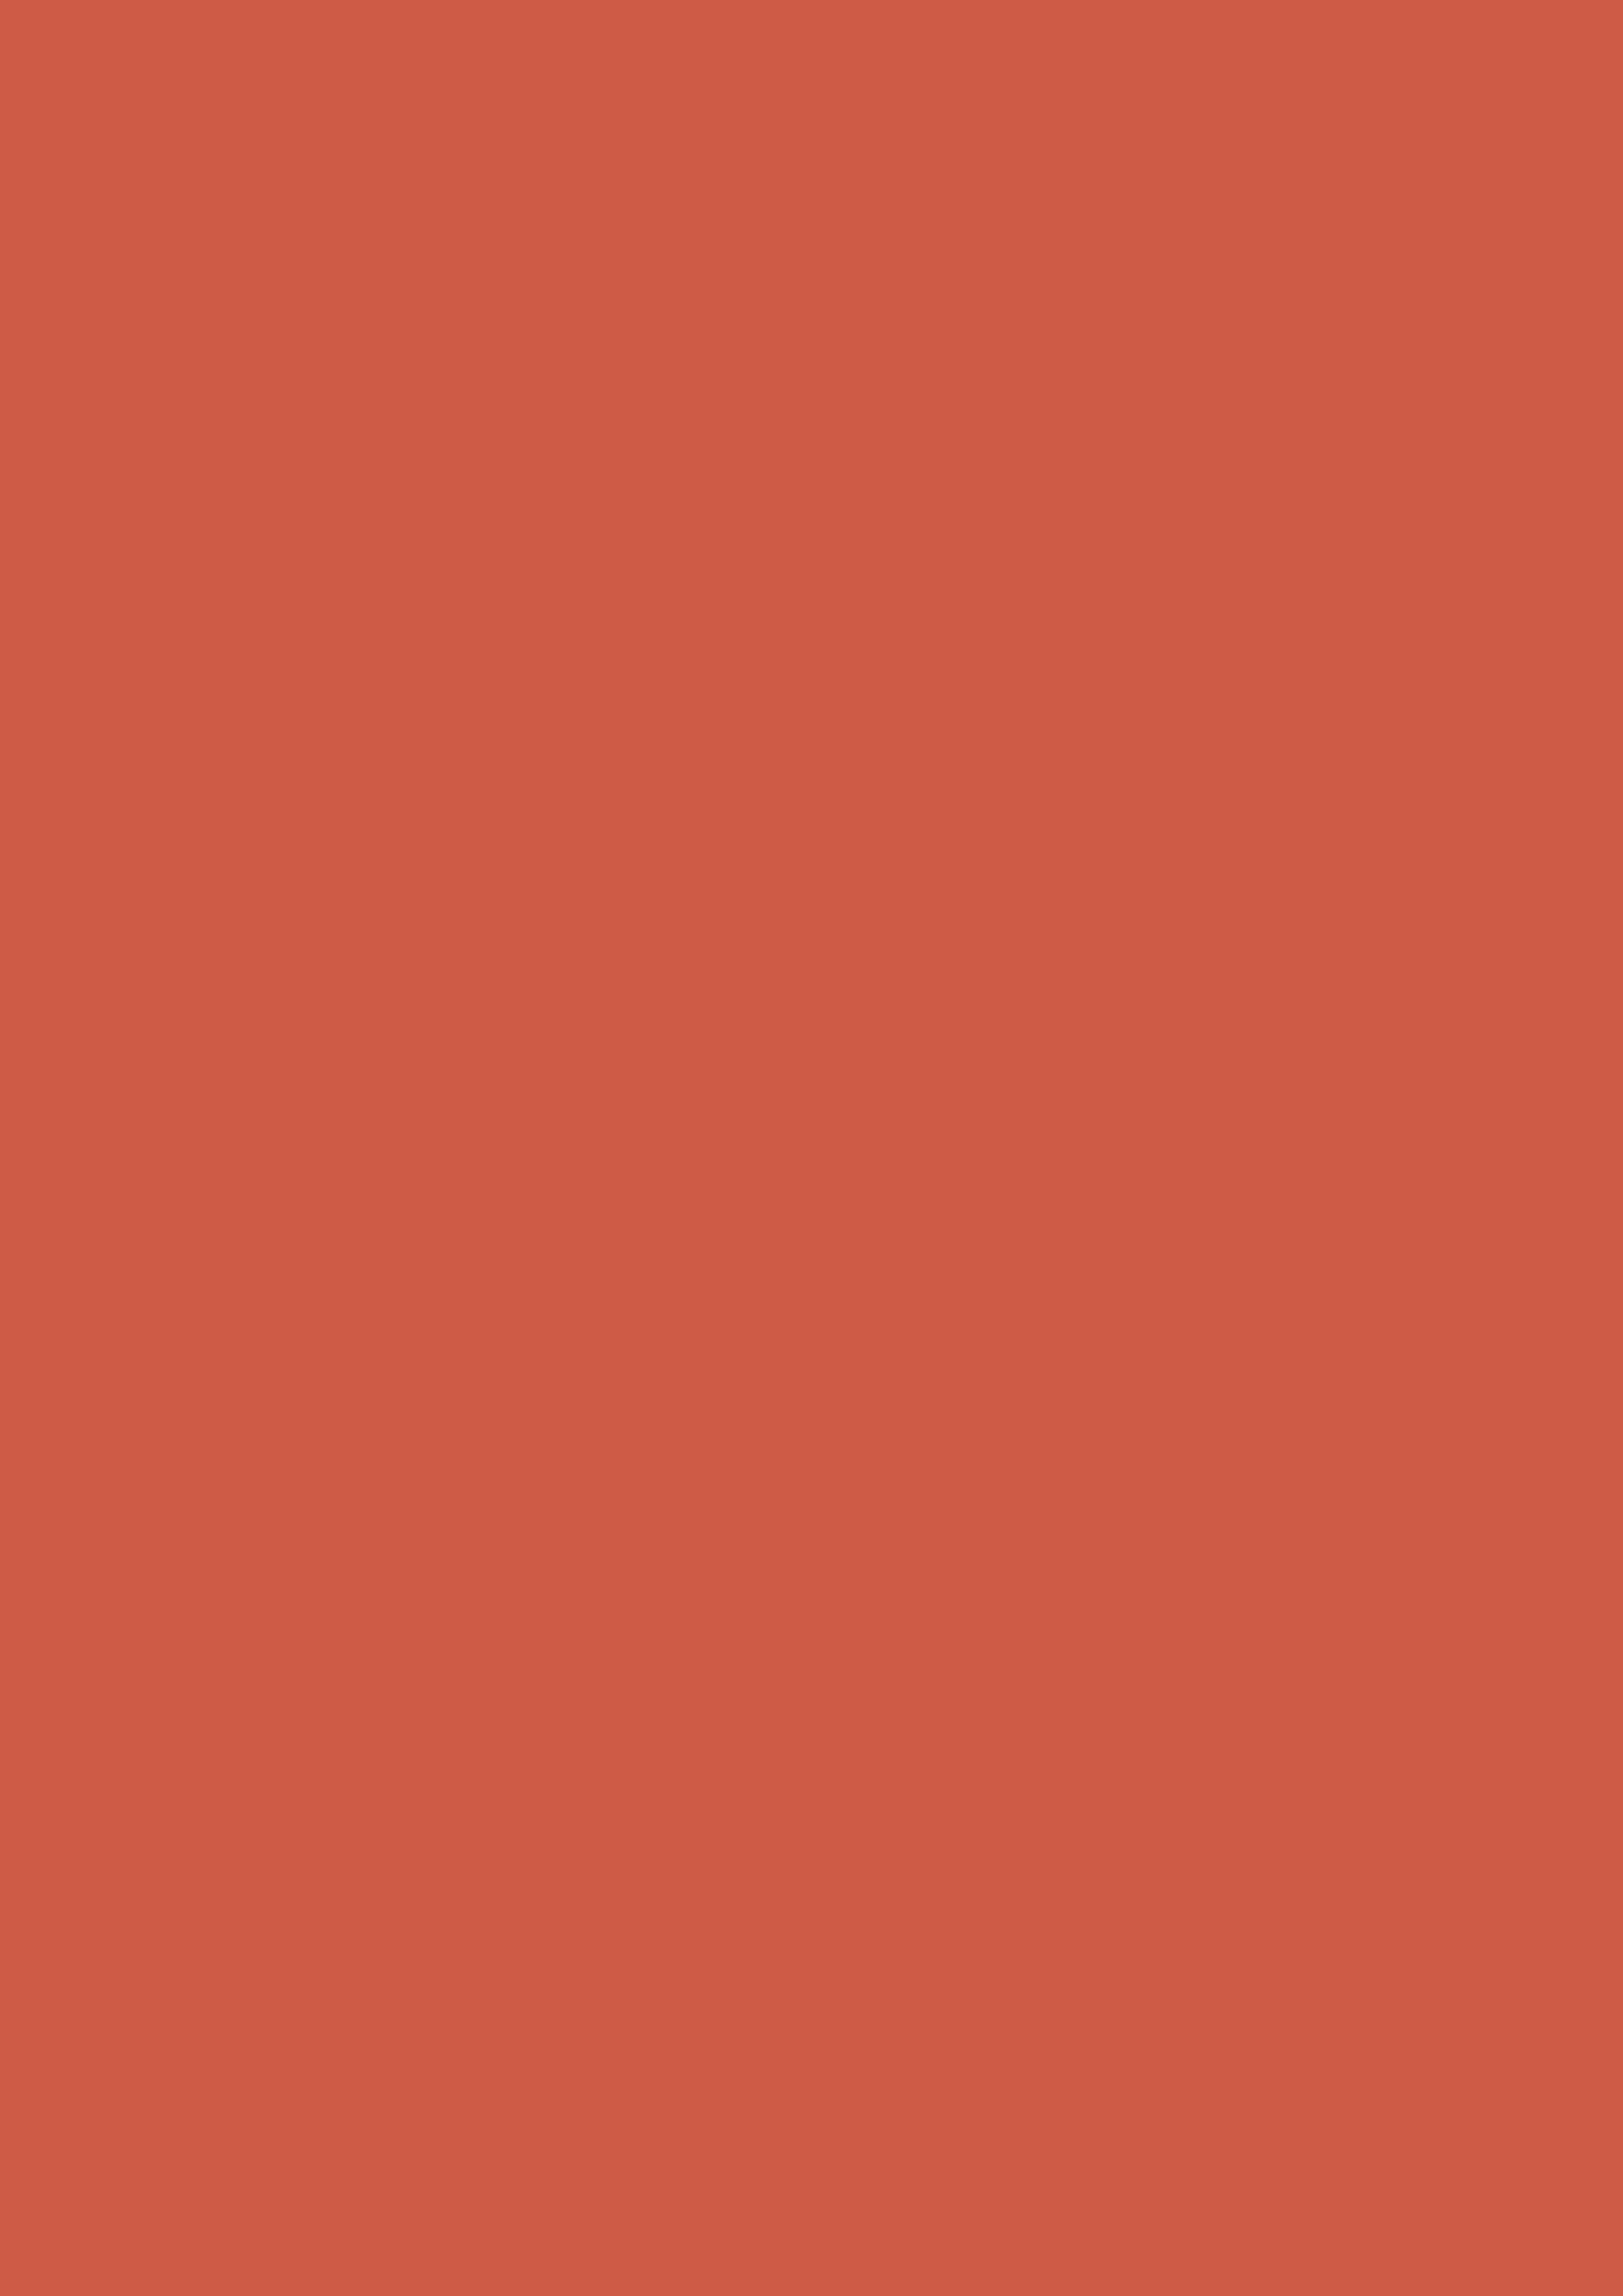 2480x3508 Dark Coral Solid Color Background